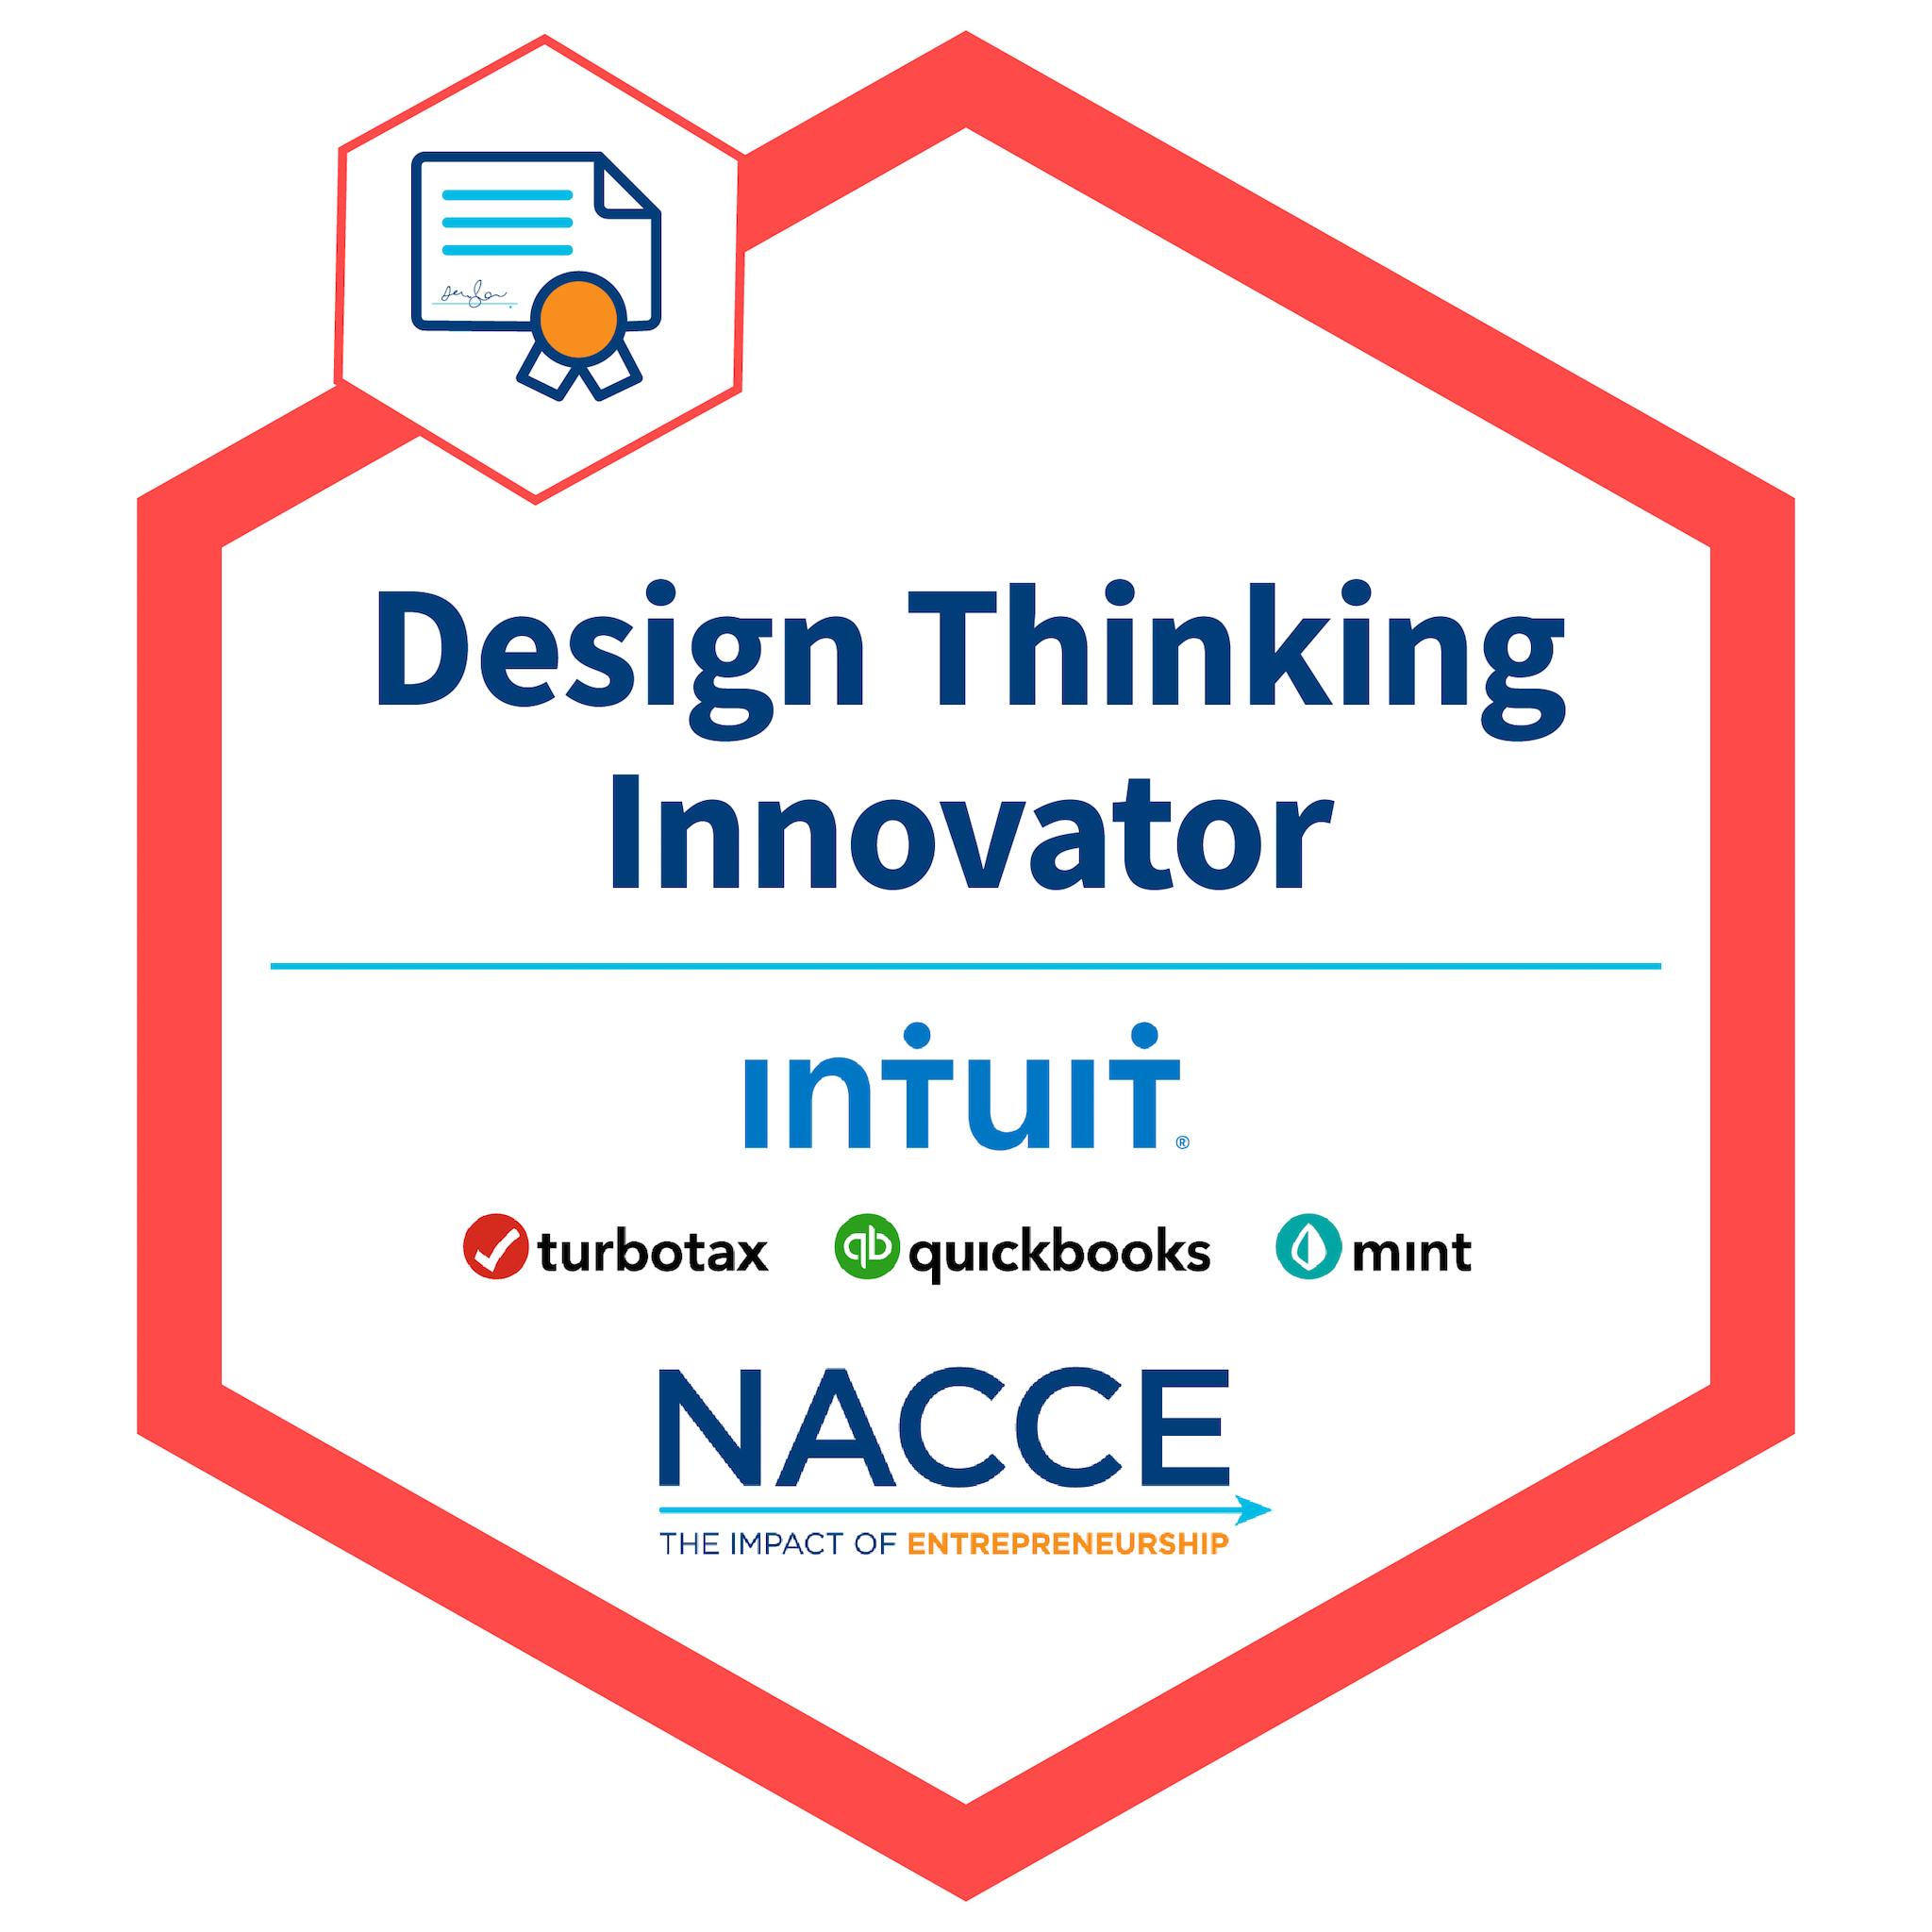 Intuit Design Thinking Innovator